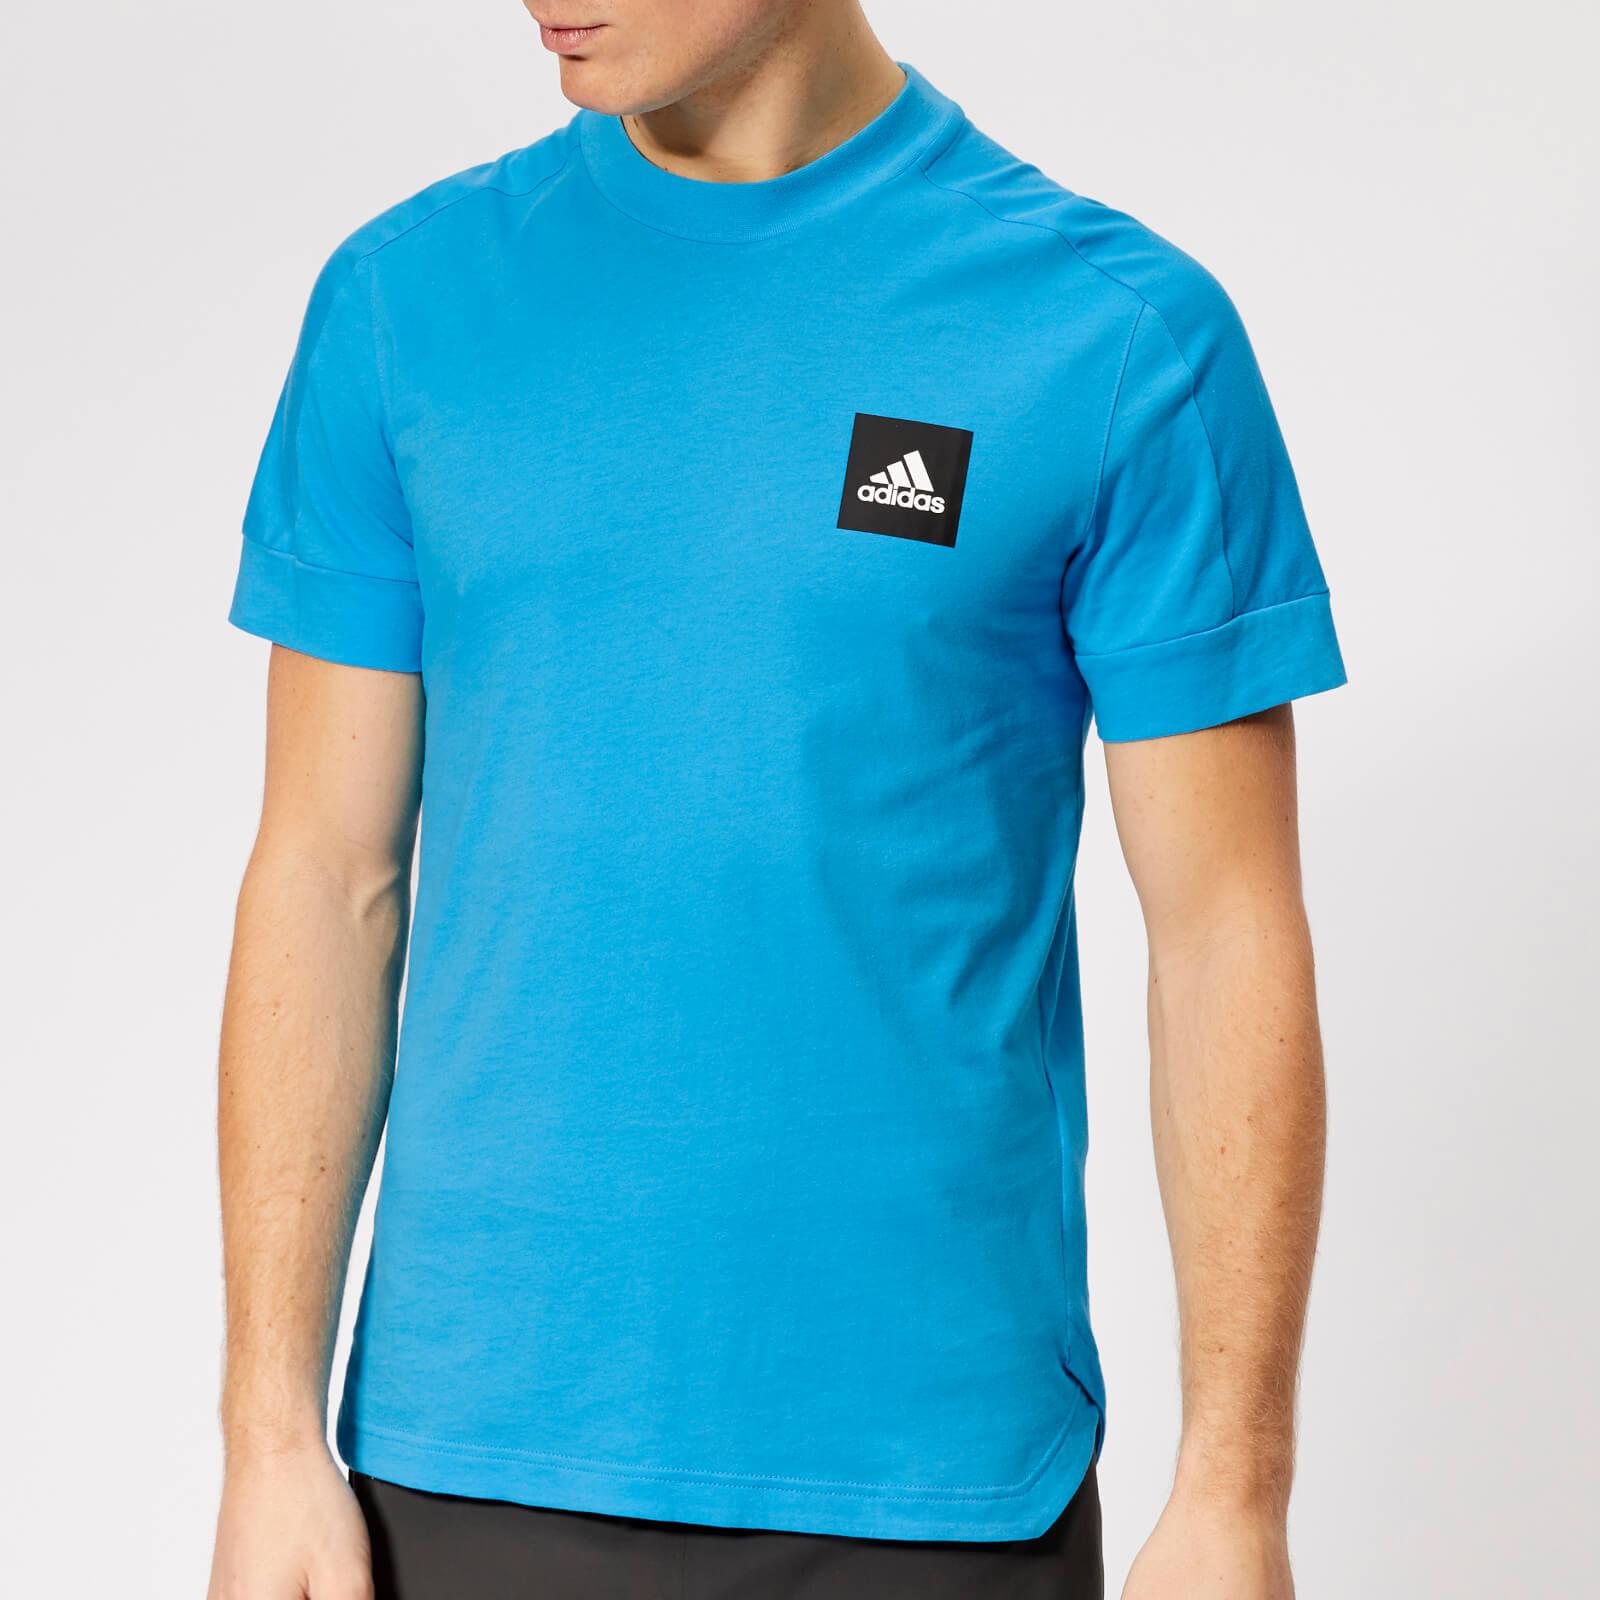 adidas Men's ID Stadium Short Sleeve T-Shirt - Shock Cyan - S - Blue